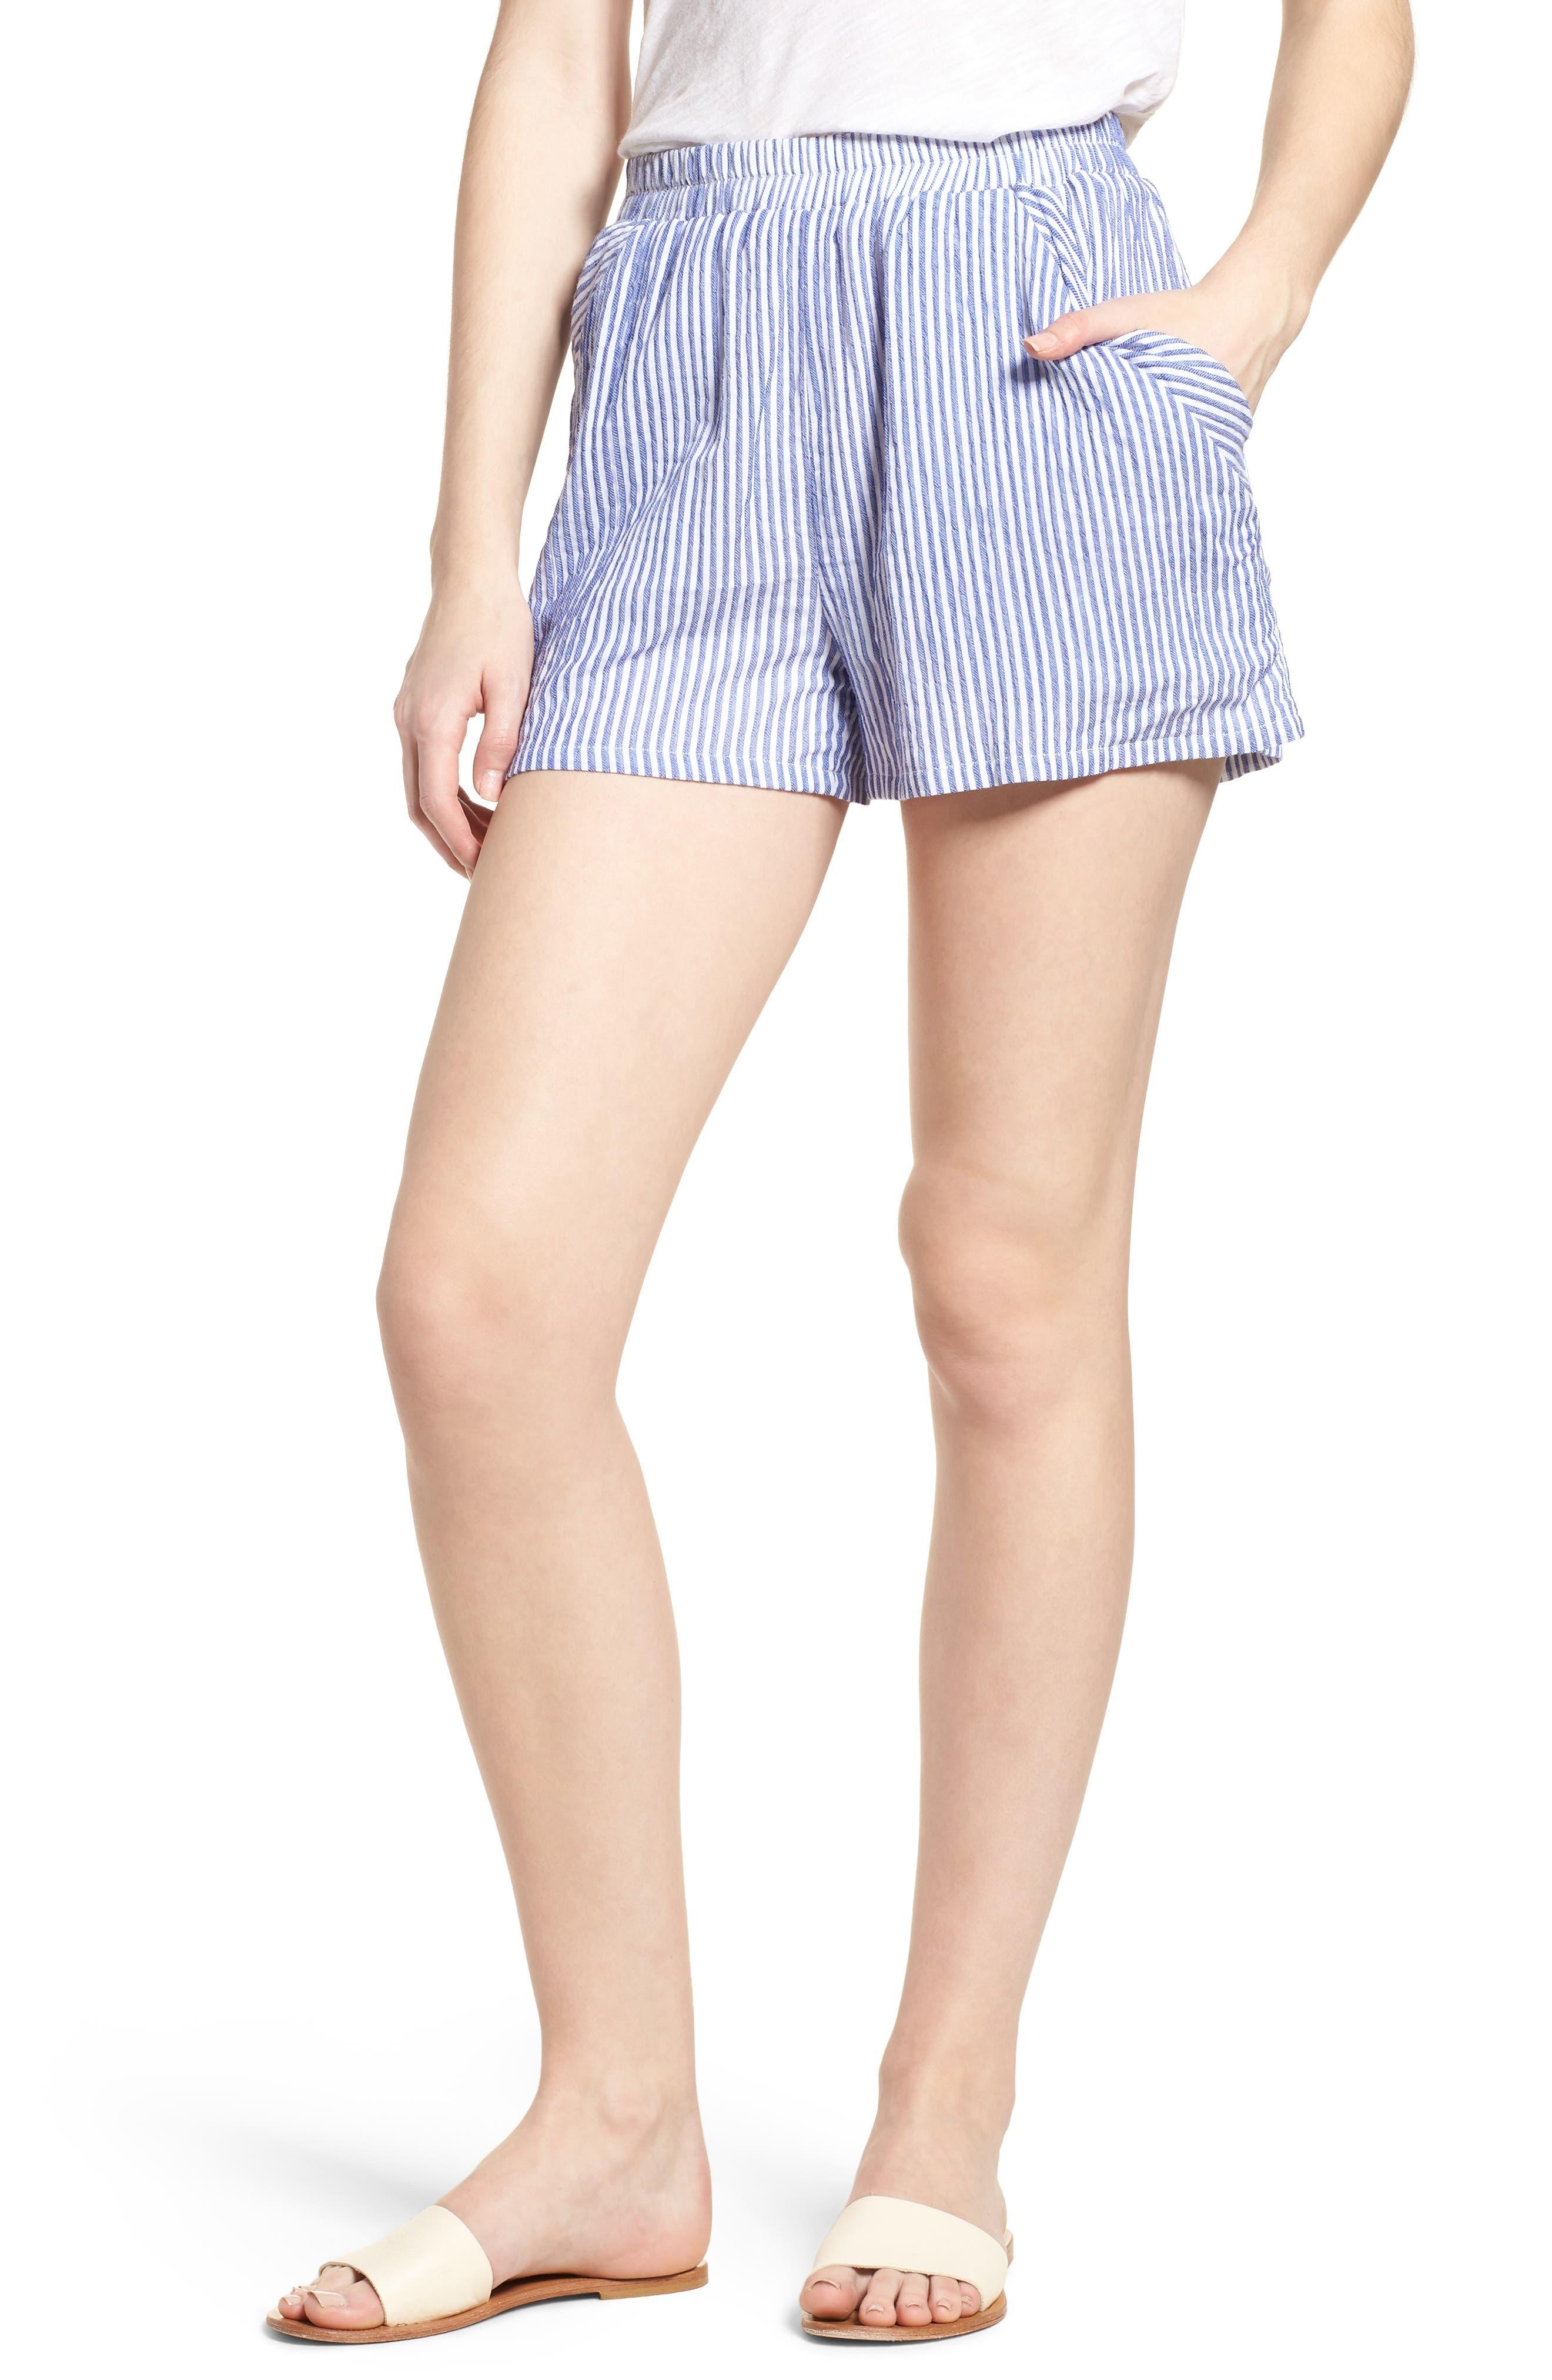 BISHOP + YOUNG Stripe Shorts, Main, color, 400